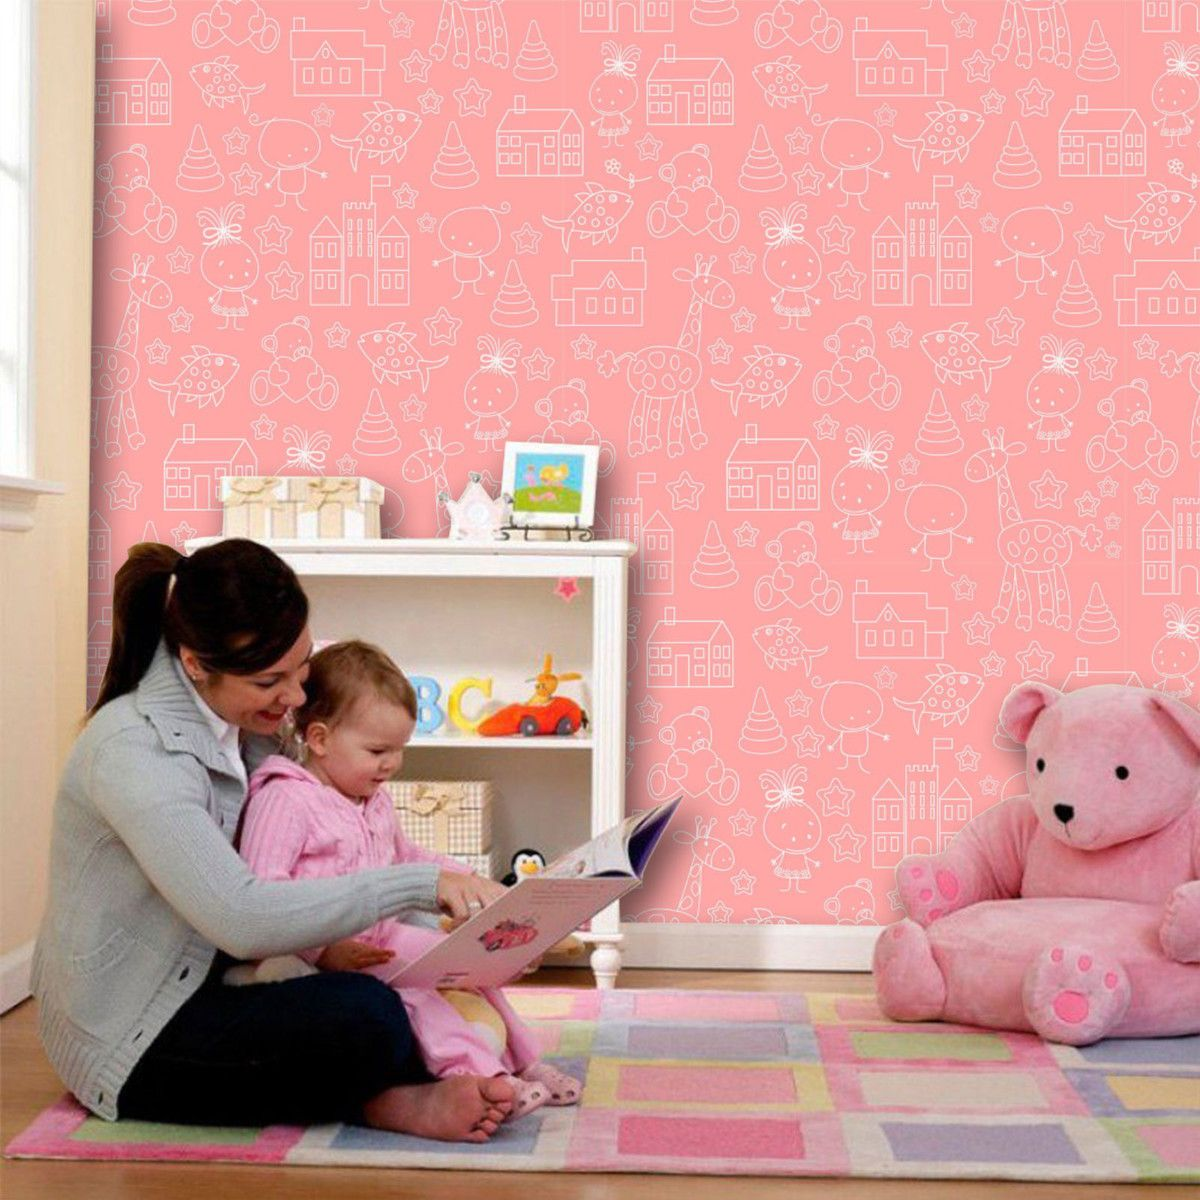 Papel de Parede Infantil 0029 - Adesivos de Parede  - Paredes Decoradas